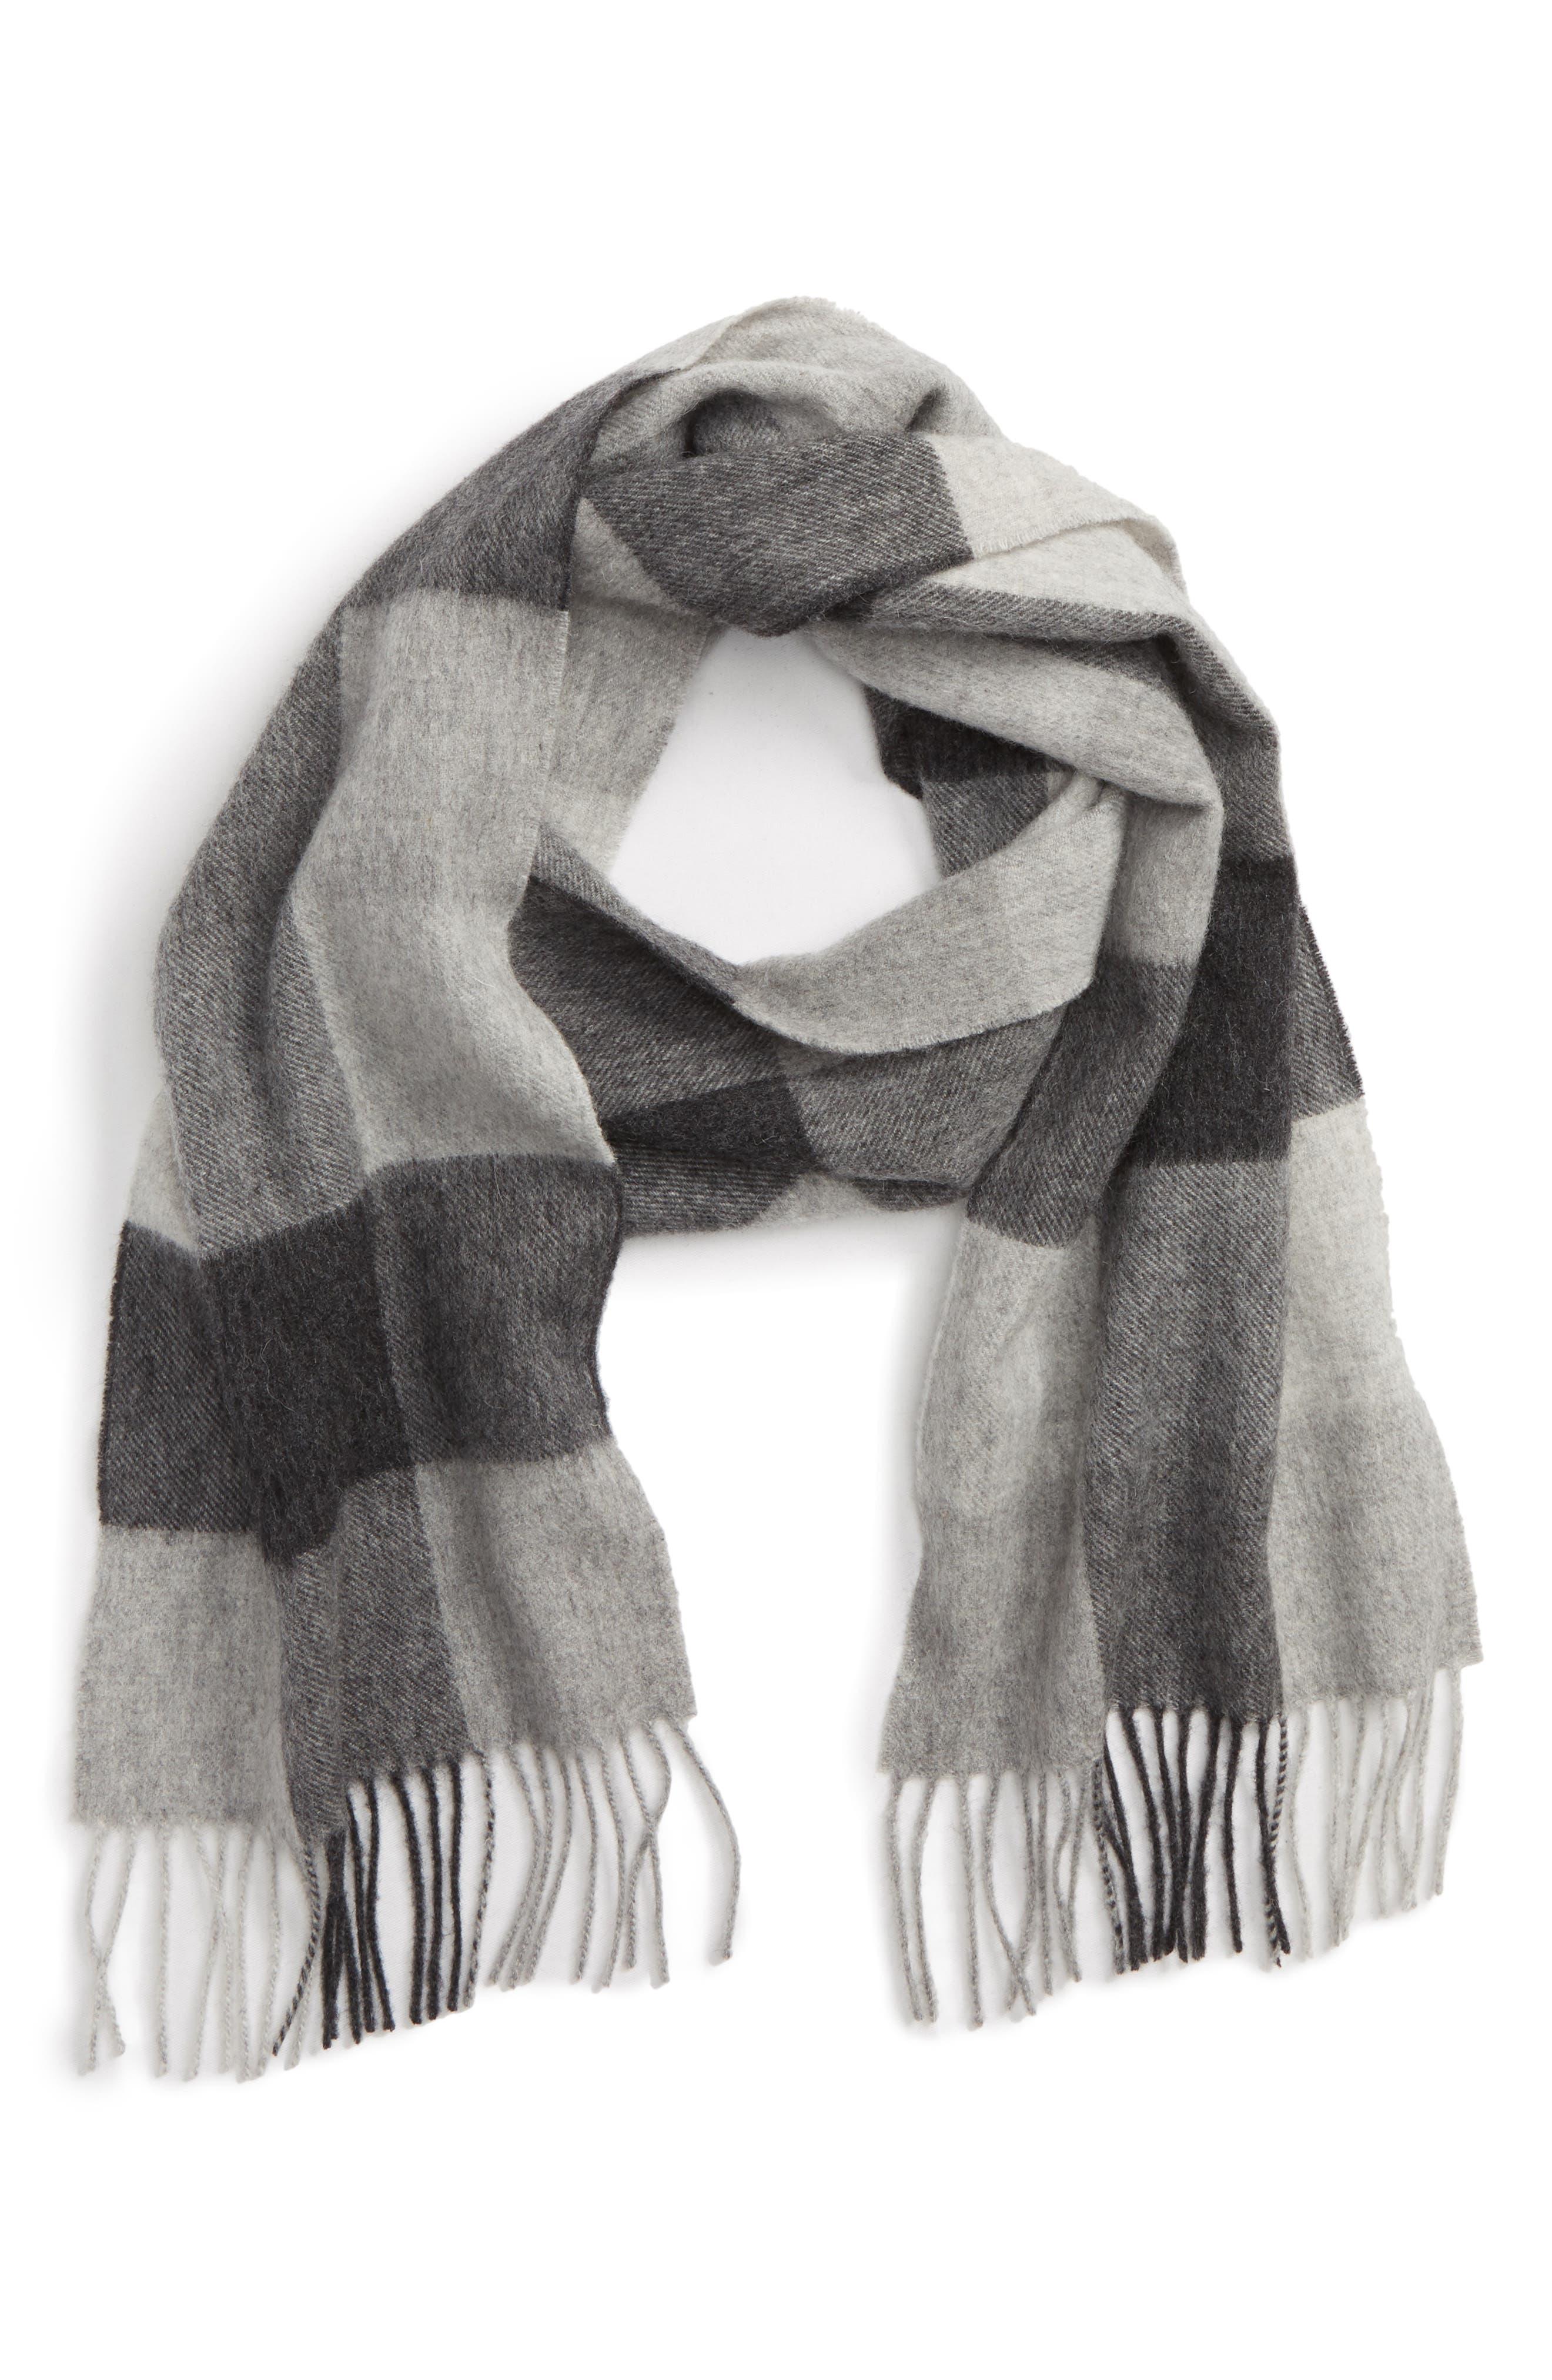 Lockton Check Merino Wool & Cashmere Scarf,                             Main thumbnail 1, color,                             020